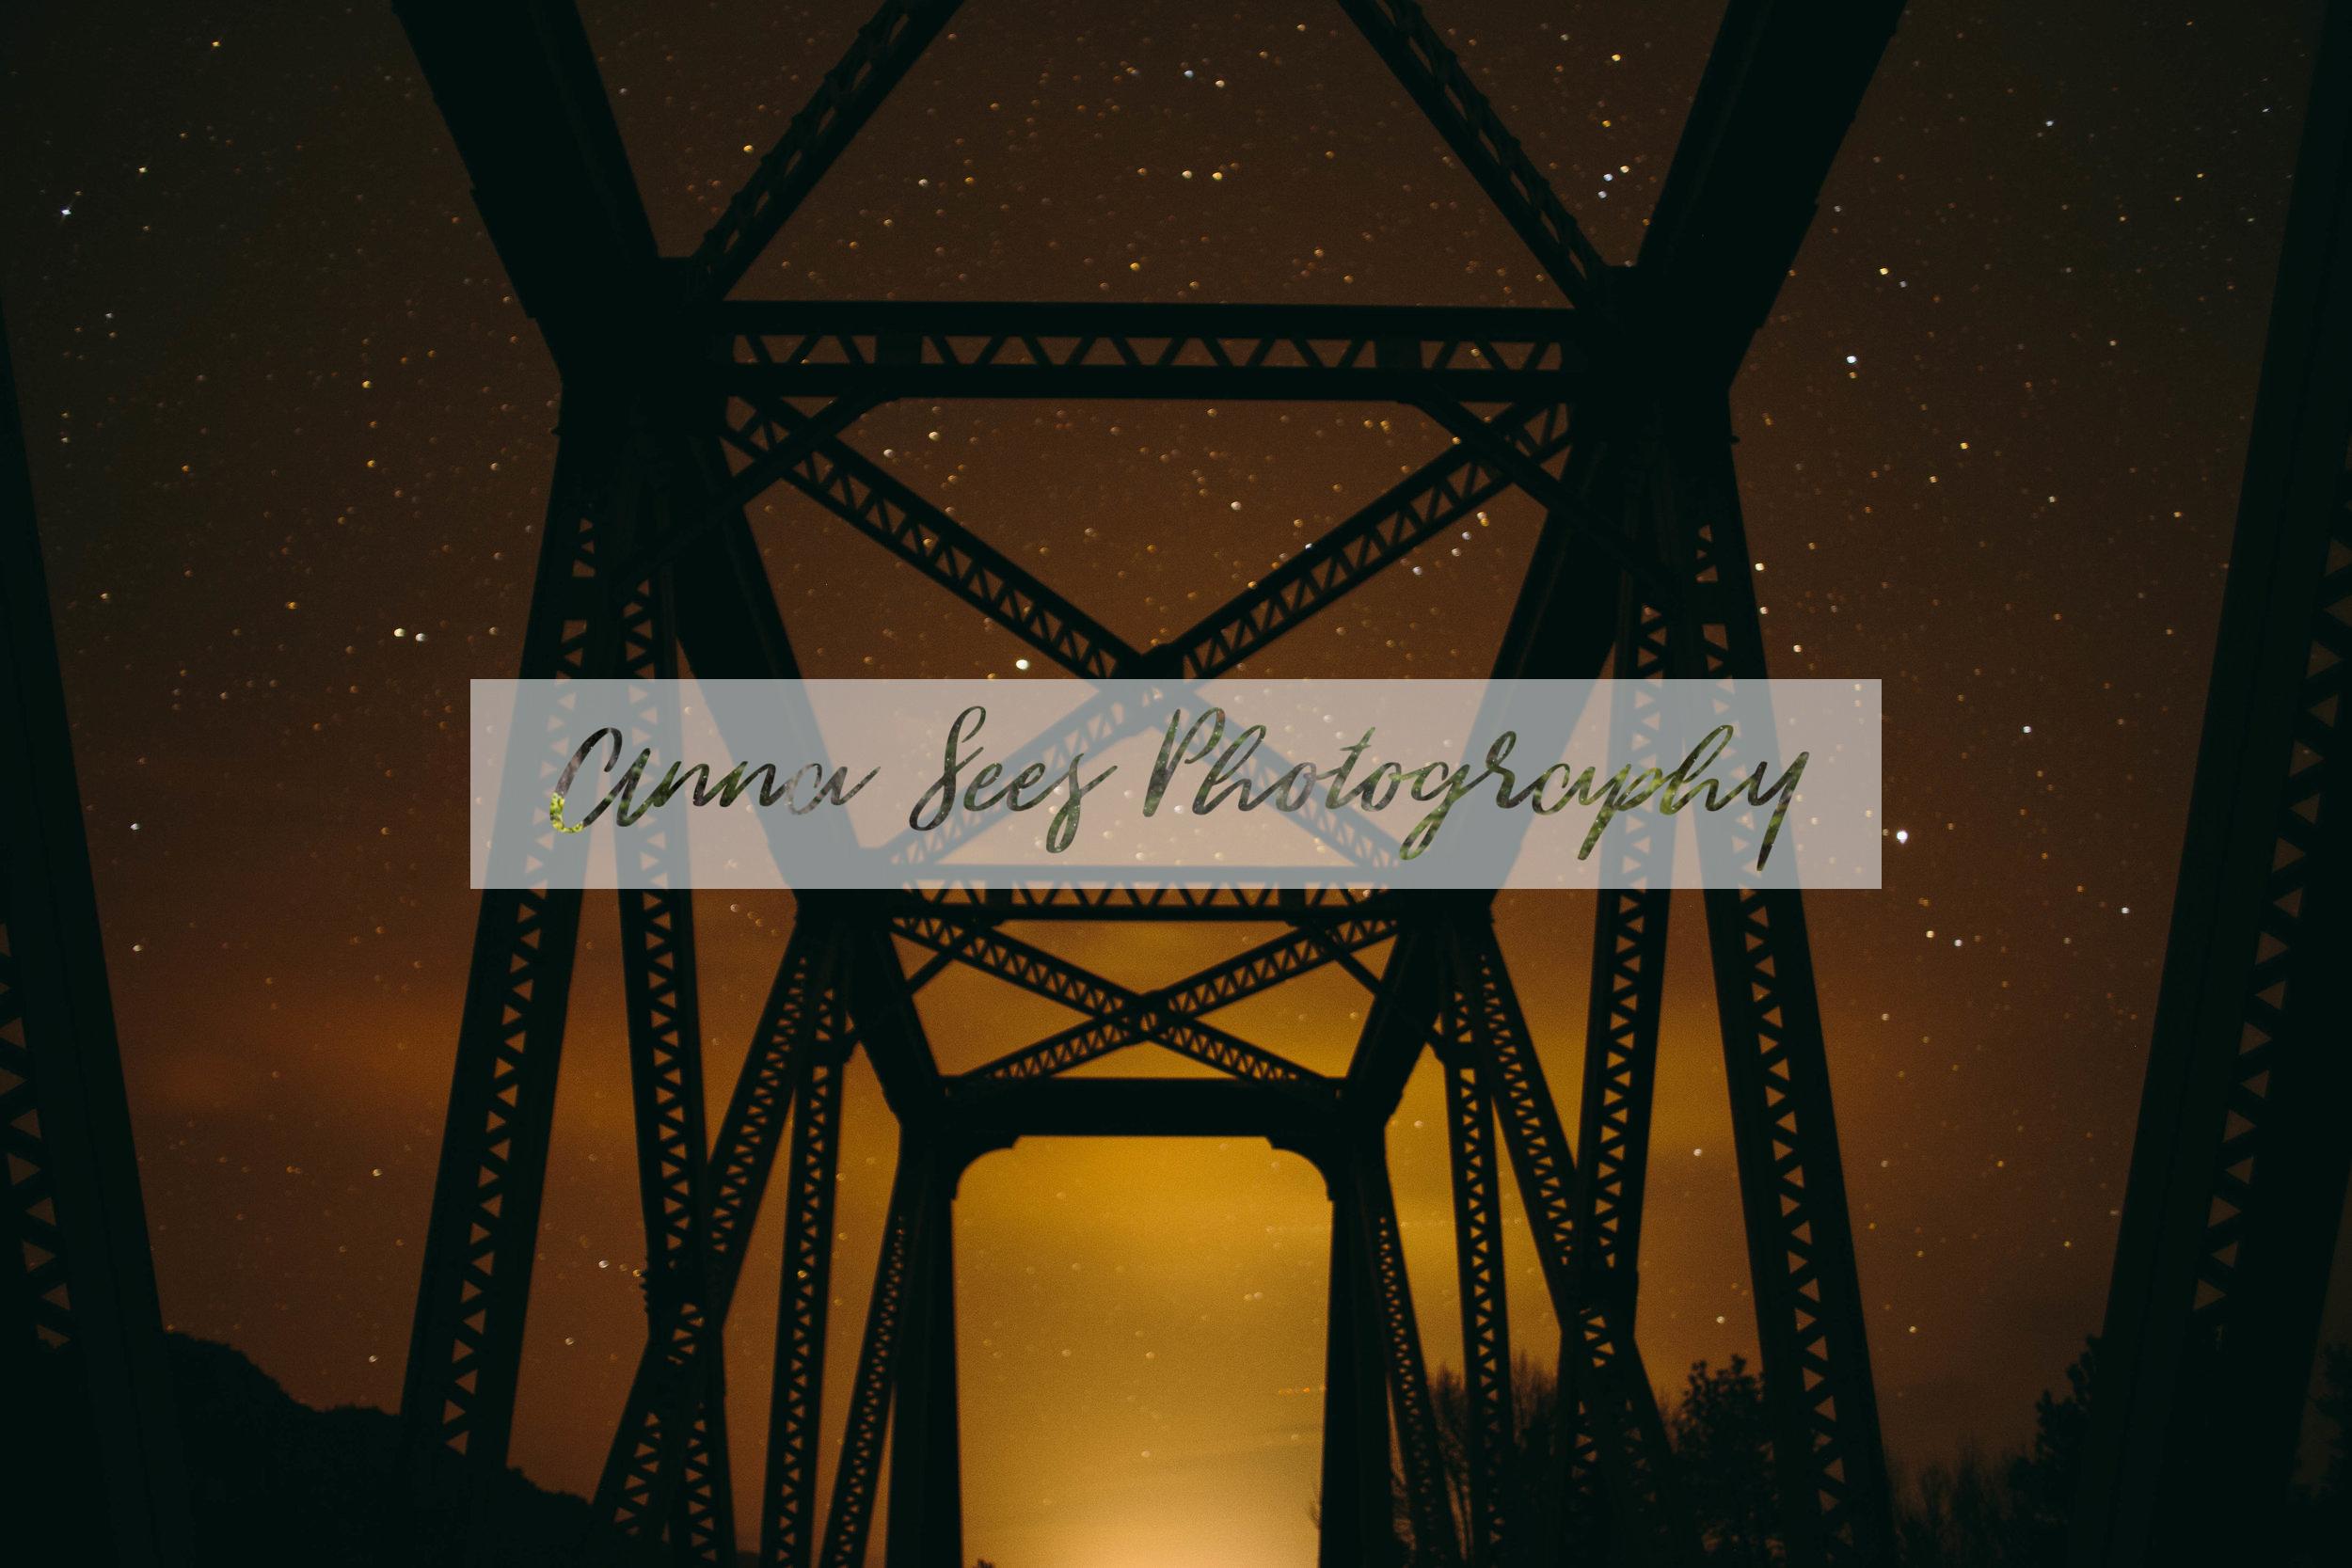 © 2019 Anna Sees Photography, LLC